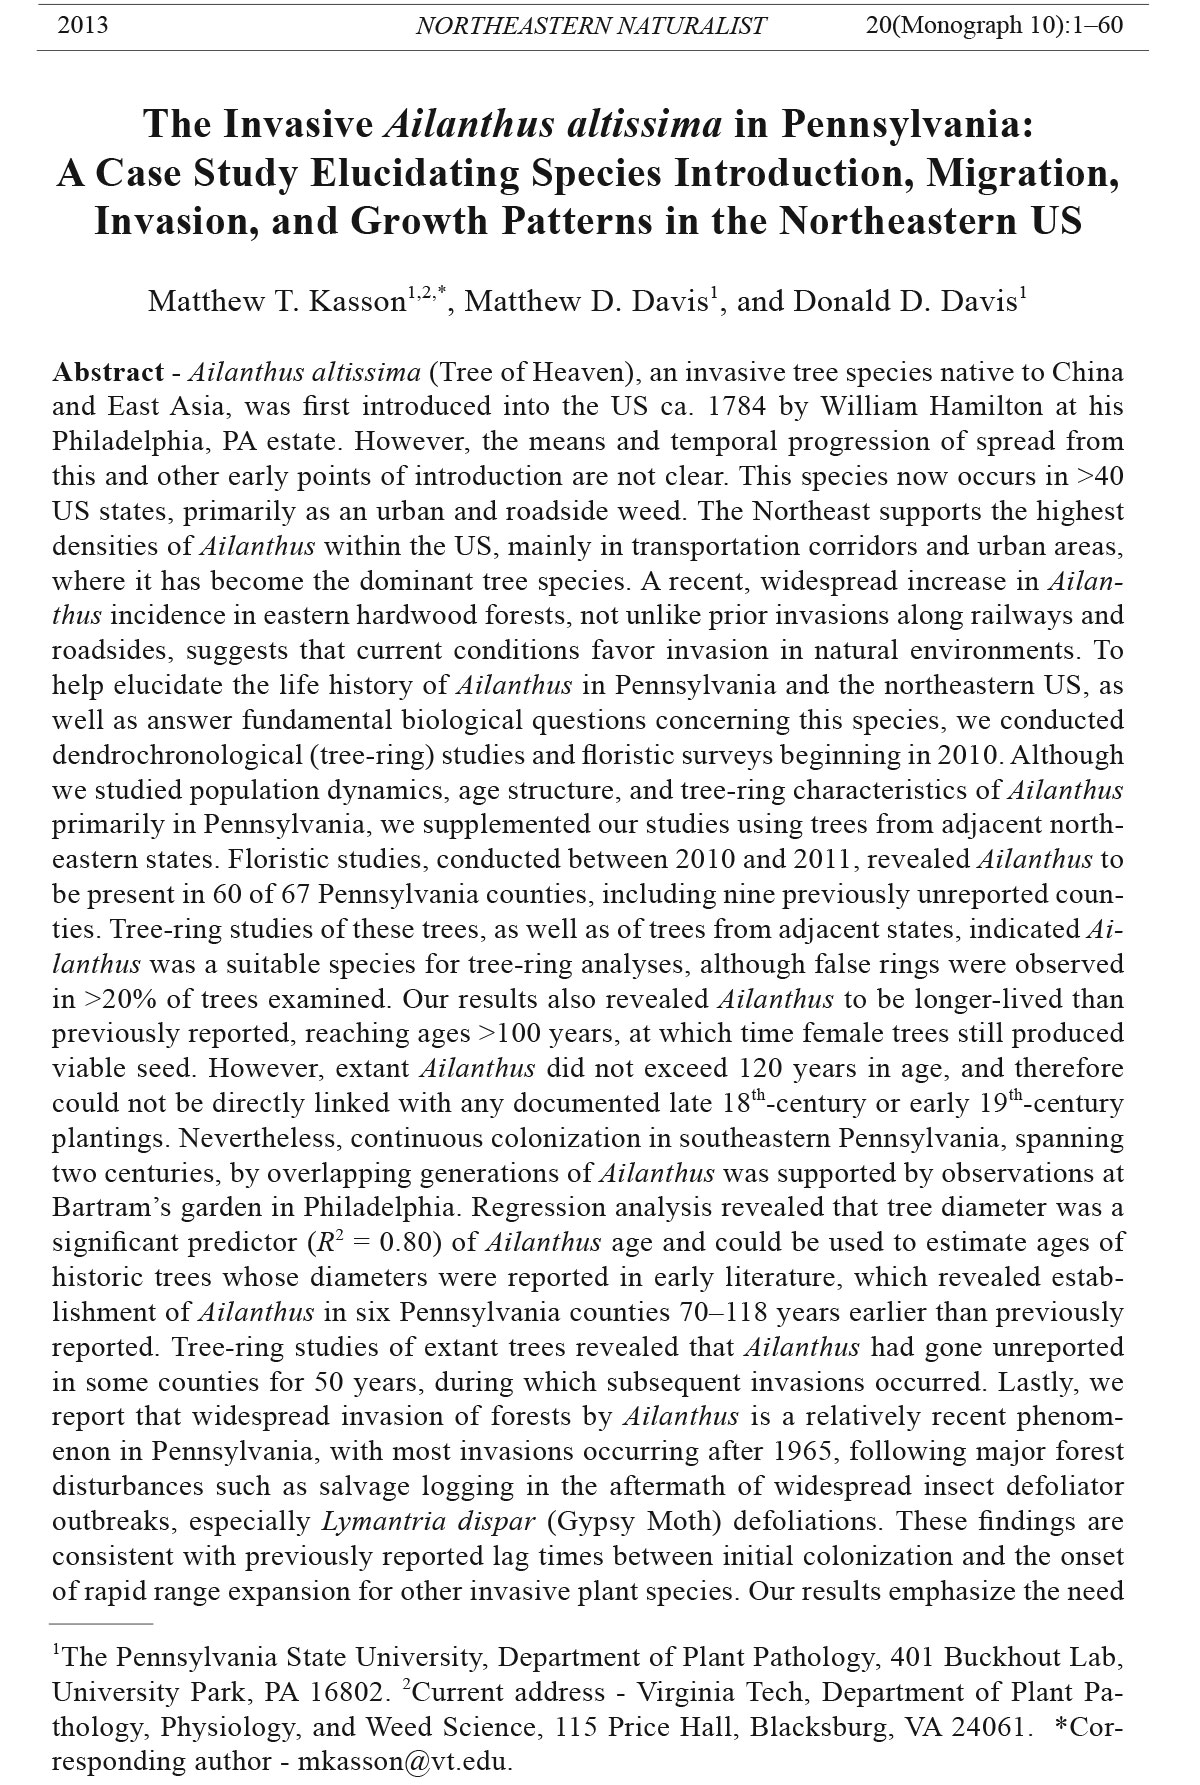 Northeastern Naturalist, Volume 20, Monograph 10 (2013): 1–42